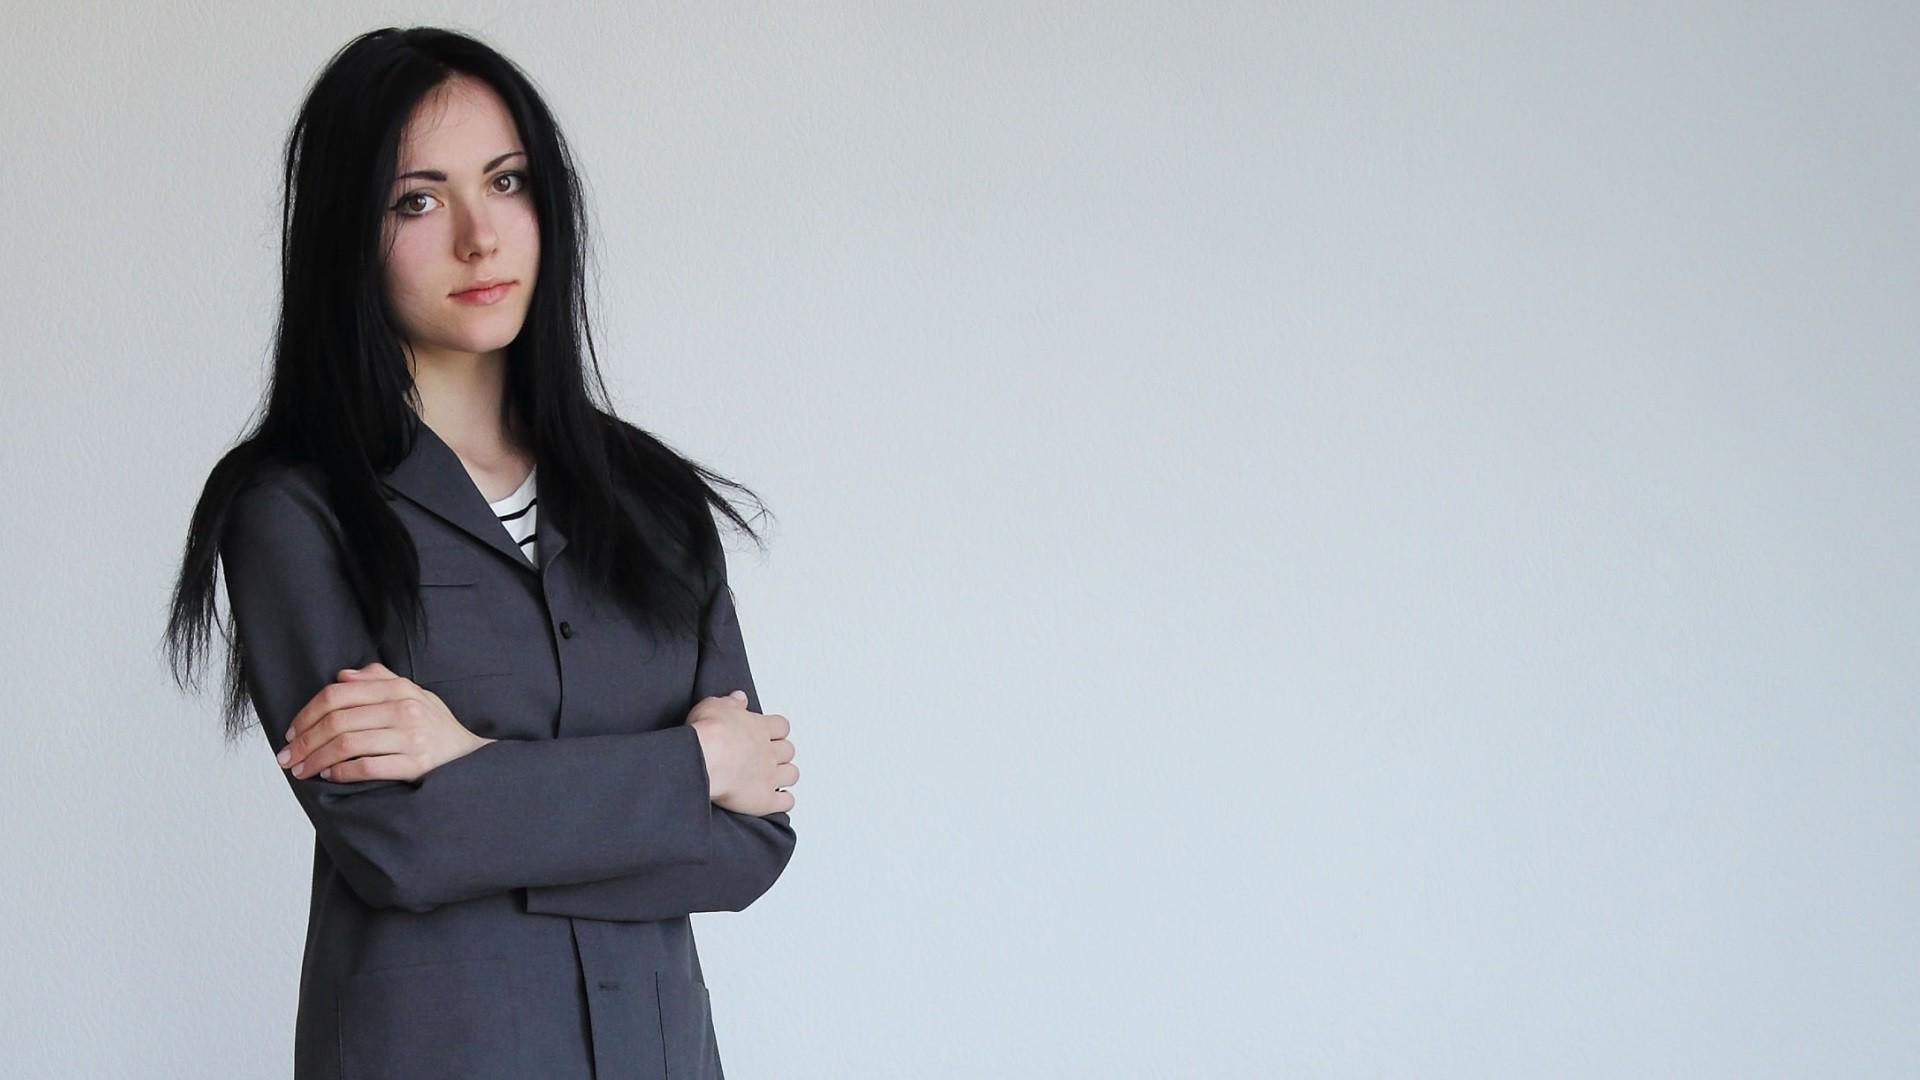 Hair Style Jeans: Wallpaper : Women, Model, Simple Background, Jacket, Dark